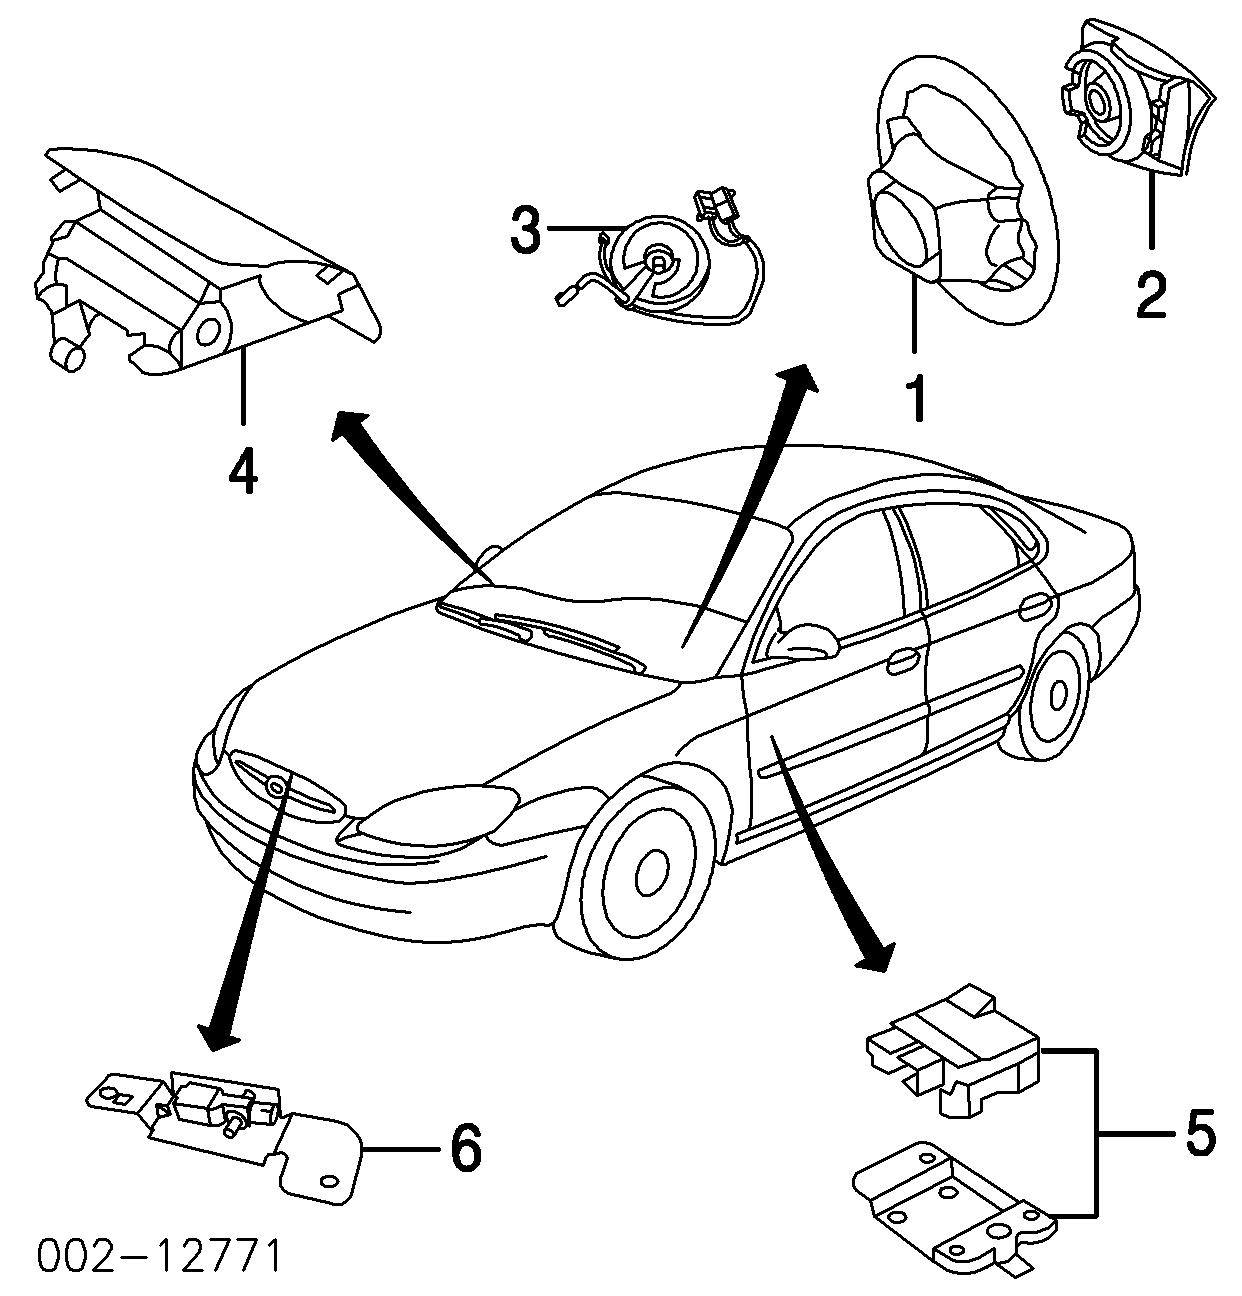 Ford Taurus Air Bag System